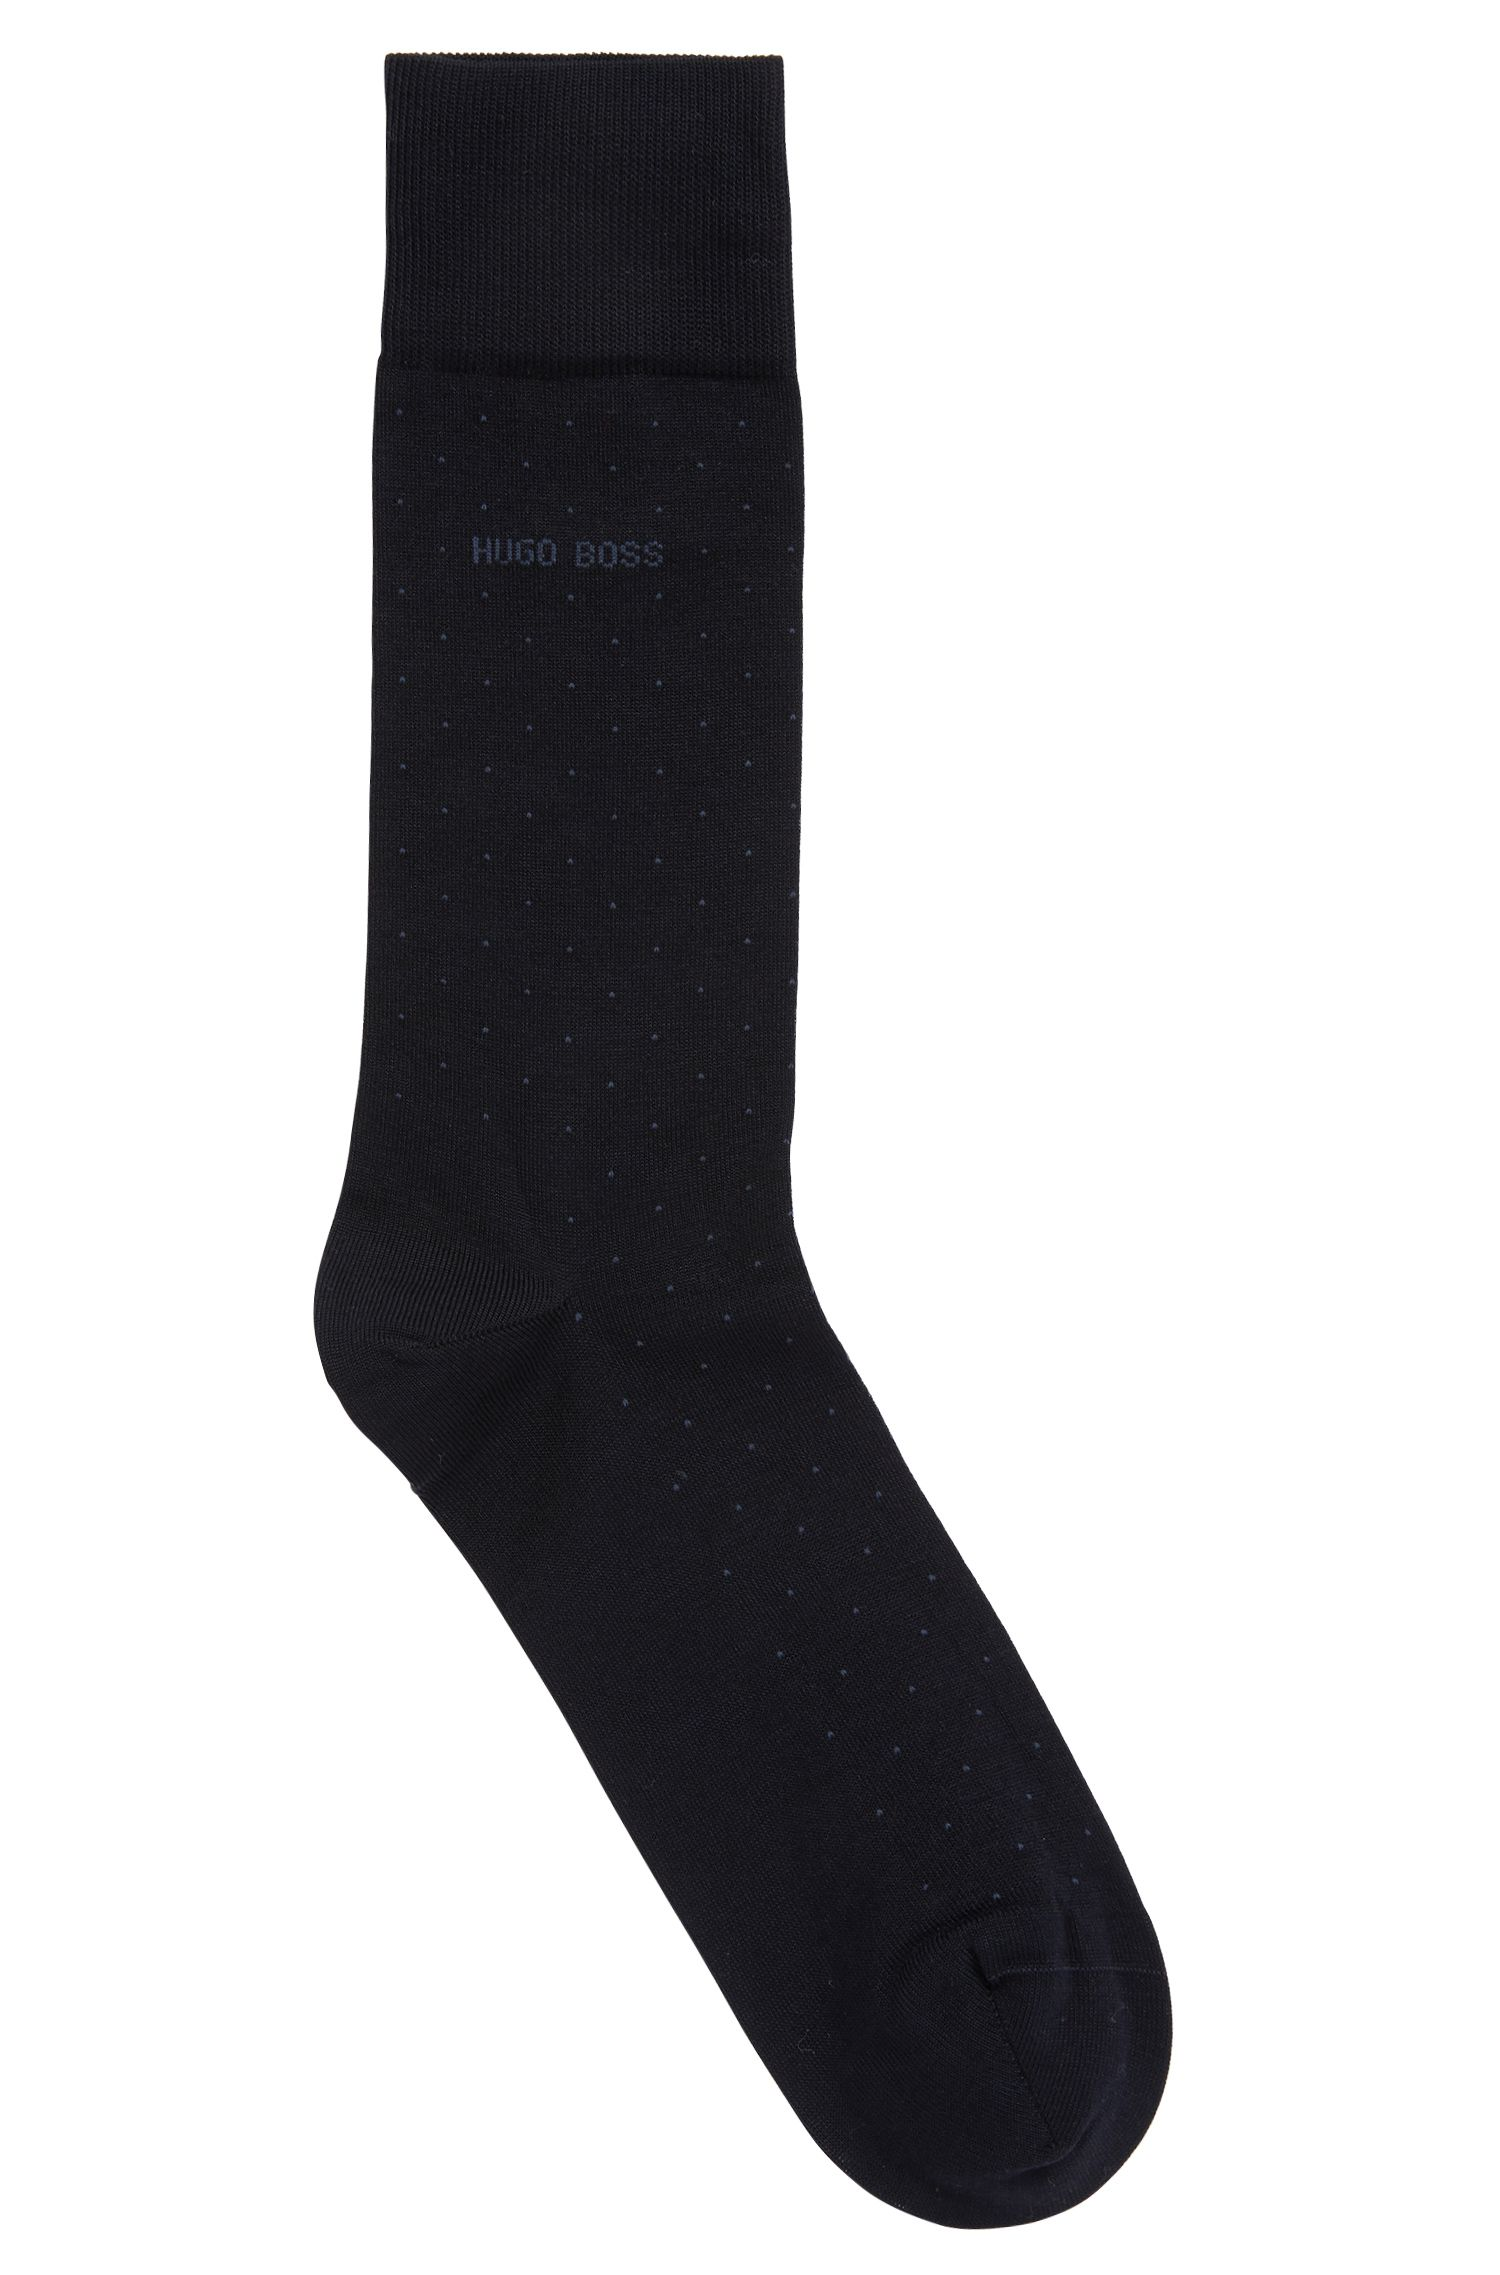 Regular-length patterned socks in a mercerized cotton blend, Dark Blue